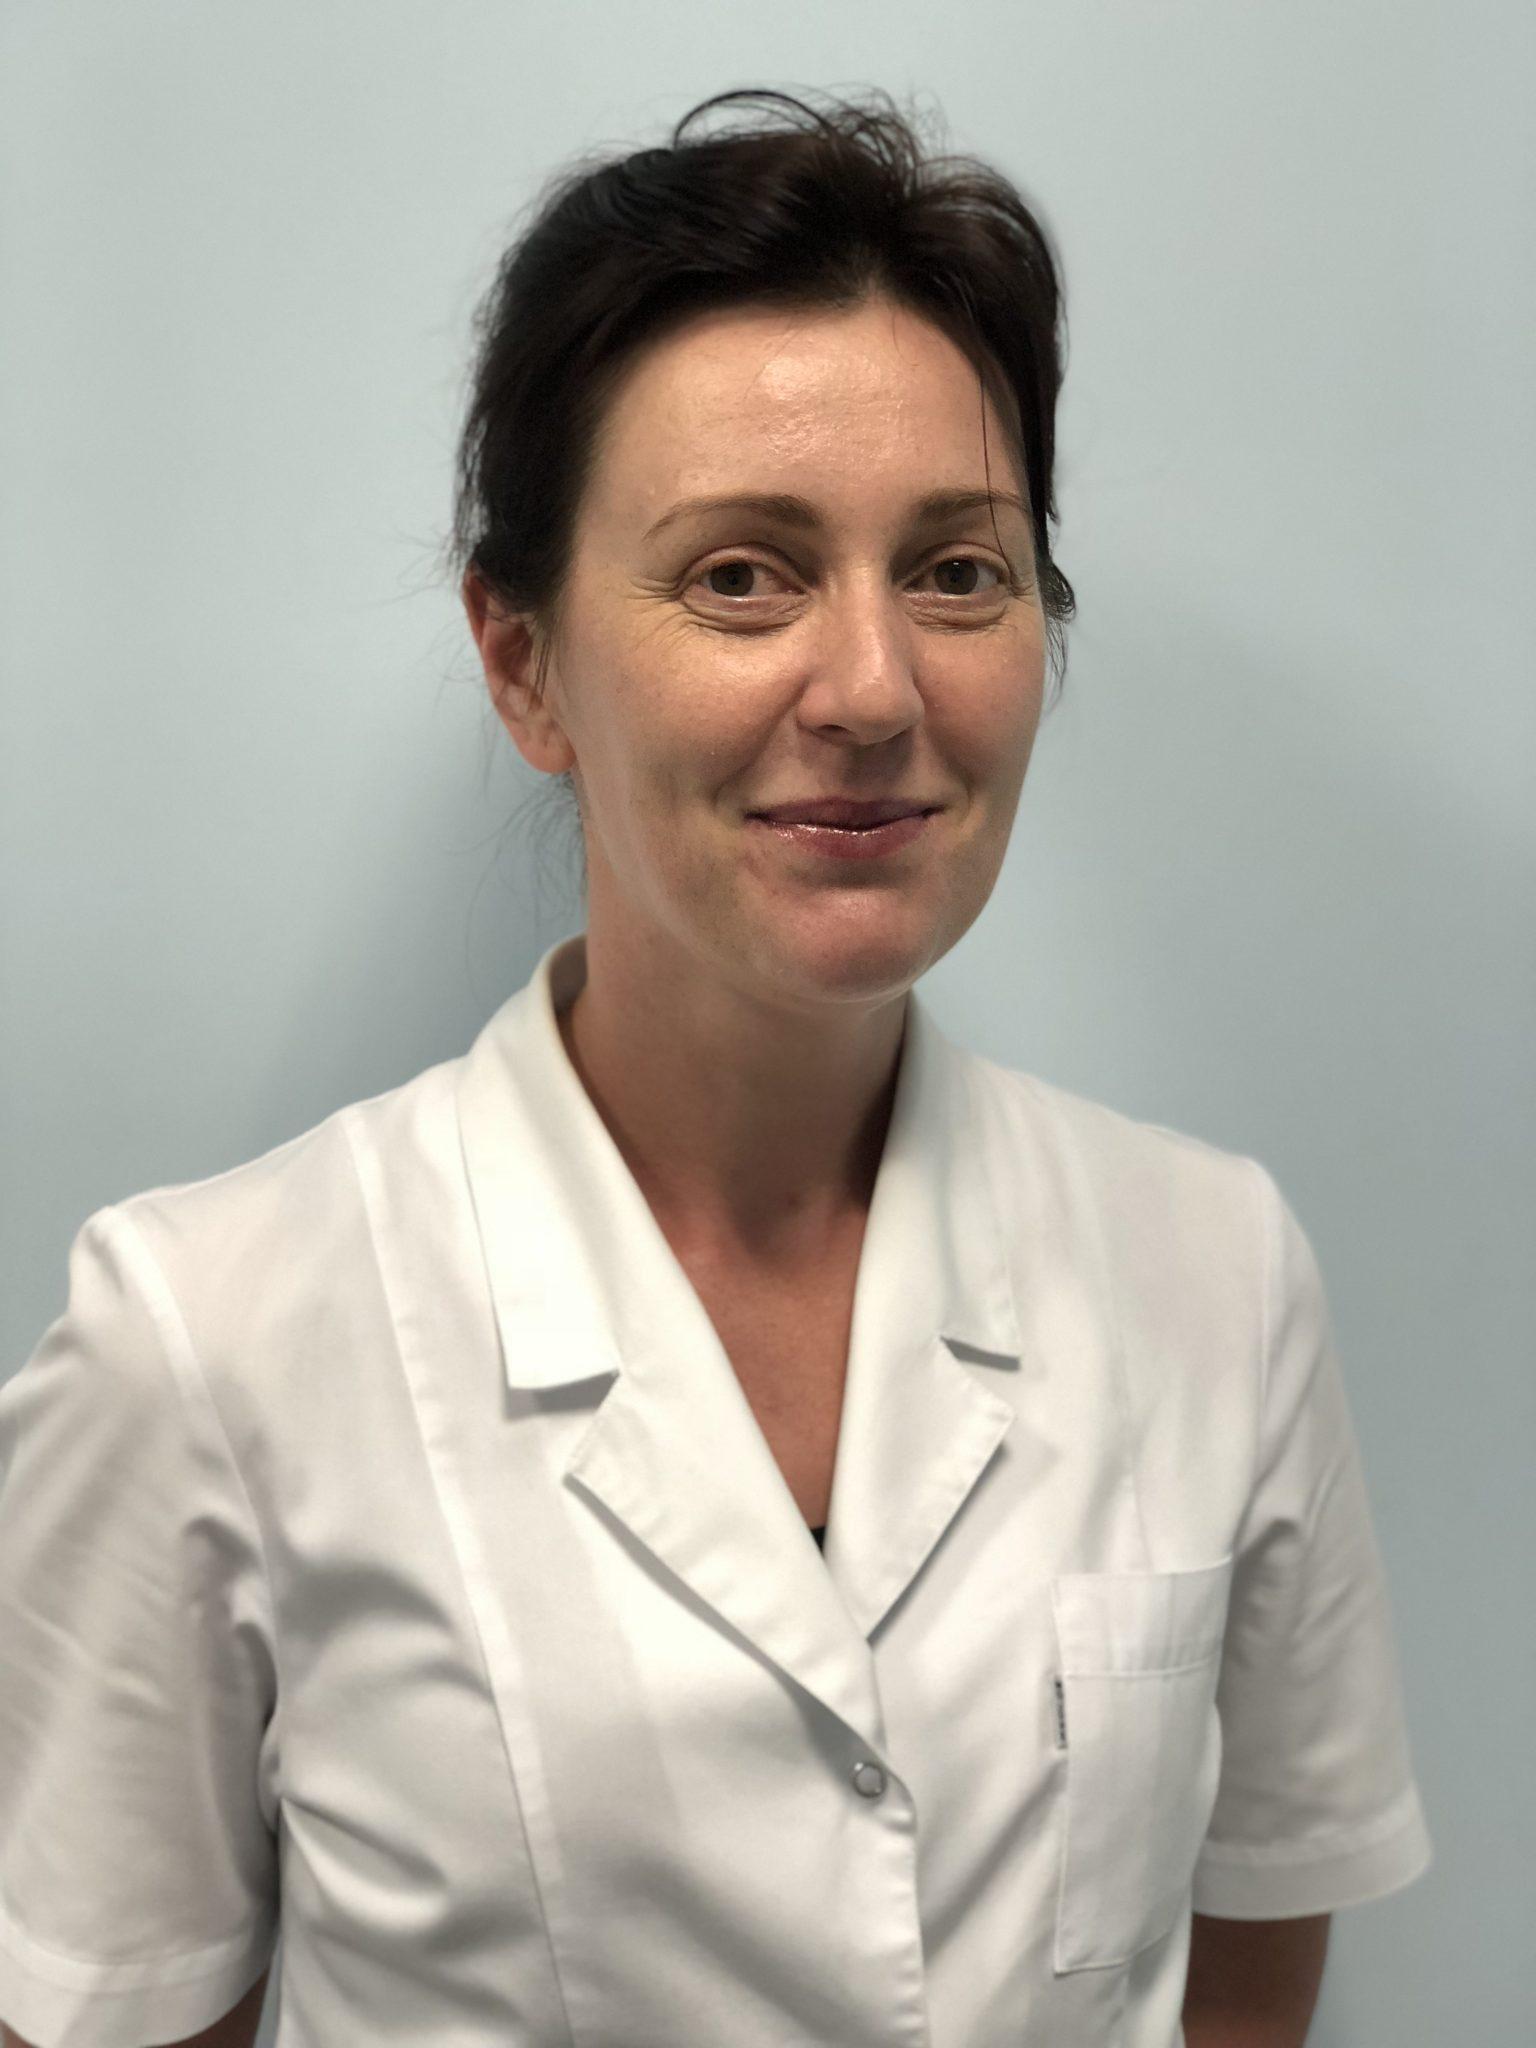 Agnieszka Nowak-Stoga